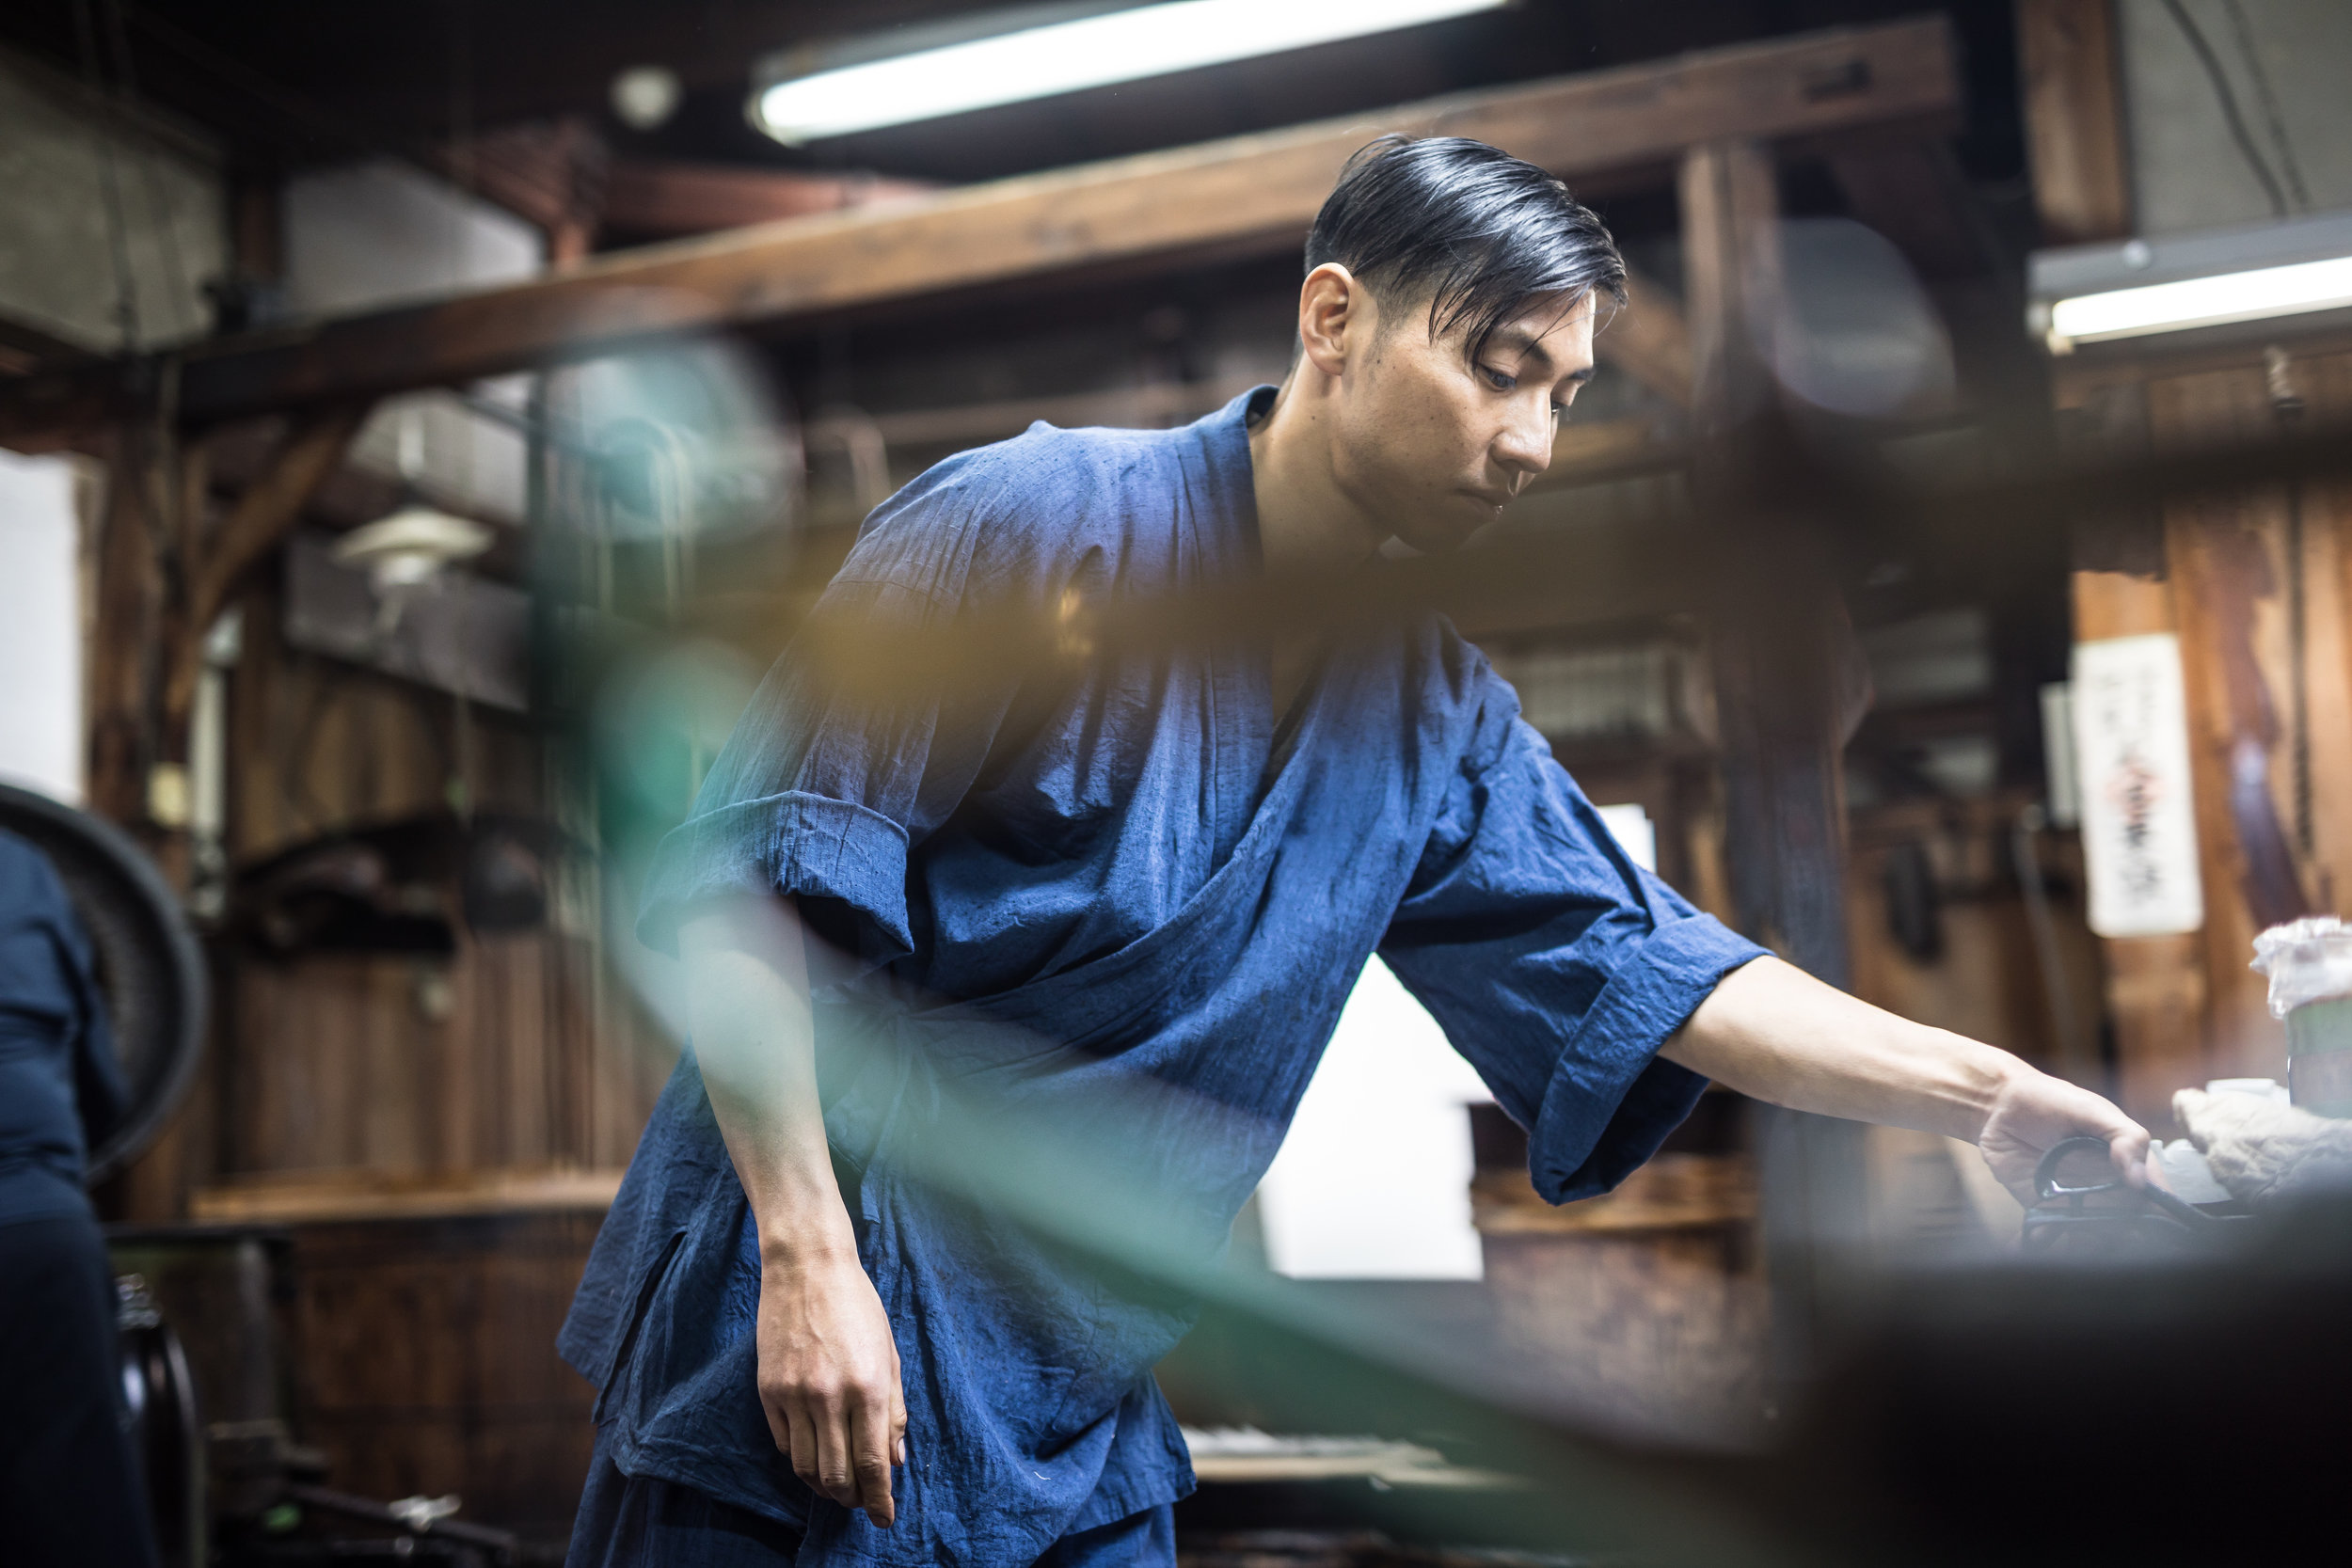 urushi kyoto.2017.04-0430.full resolution.jpg